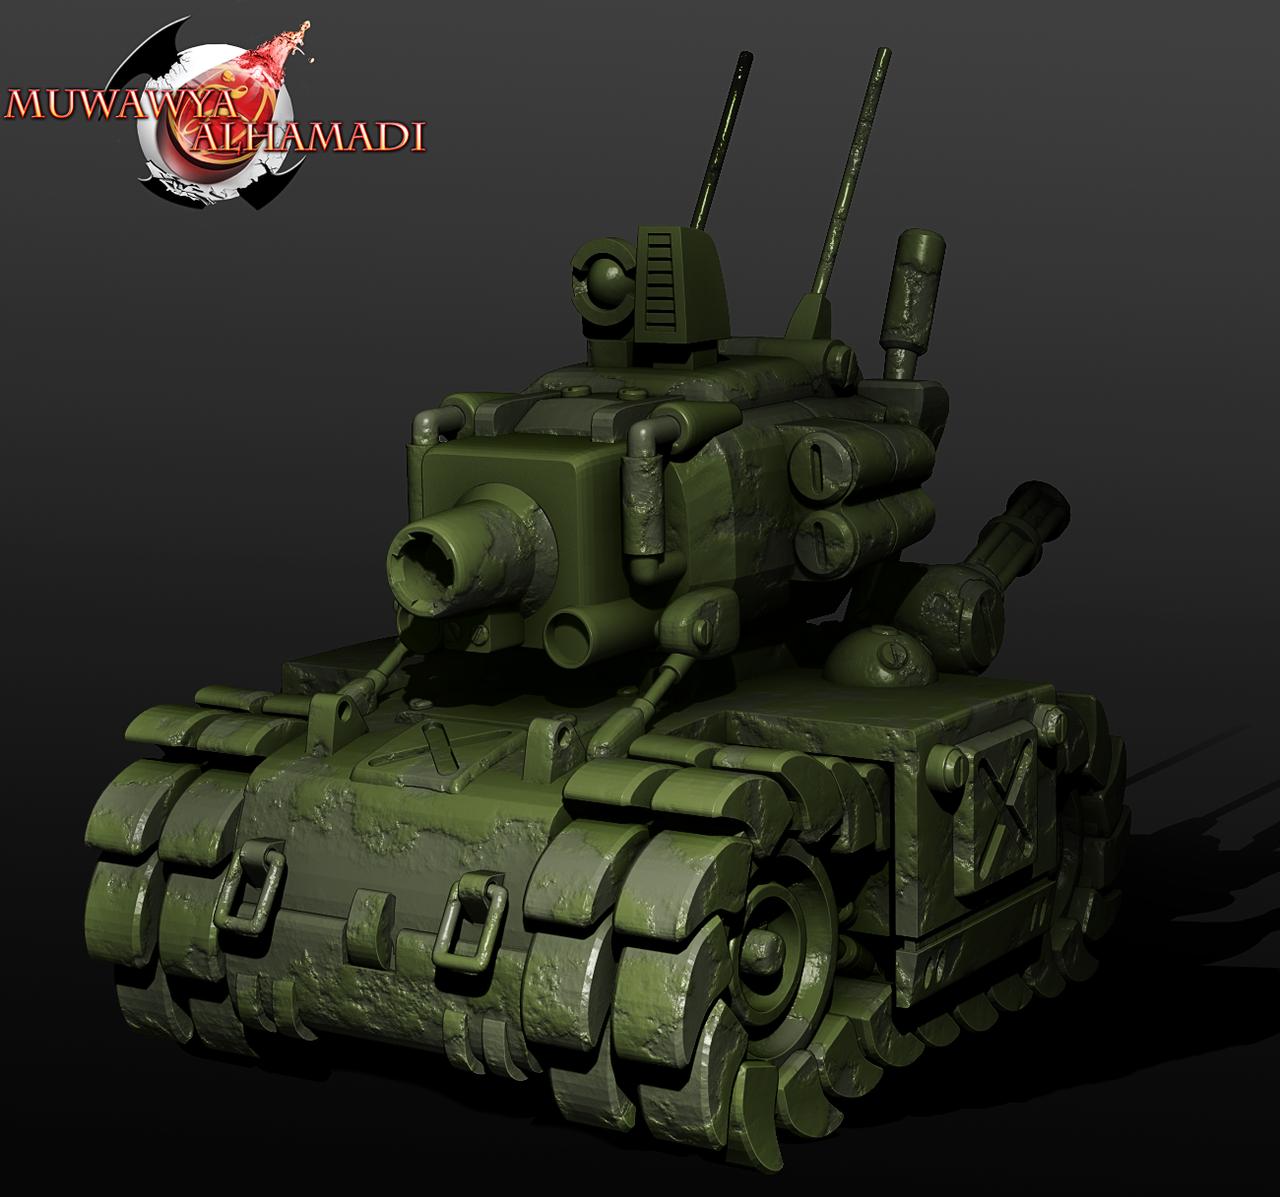 metal_slug_tank_by_muwawya_alhamadi-d9t9pto